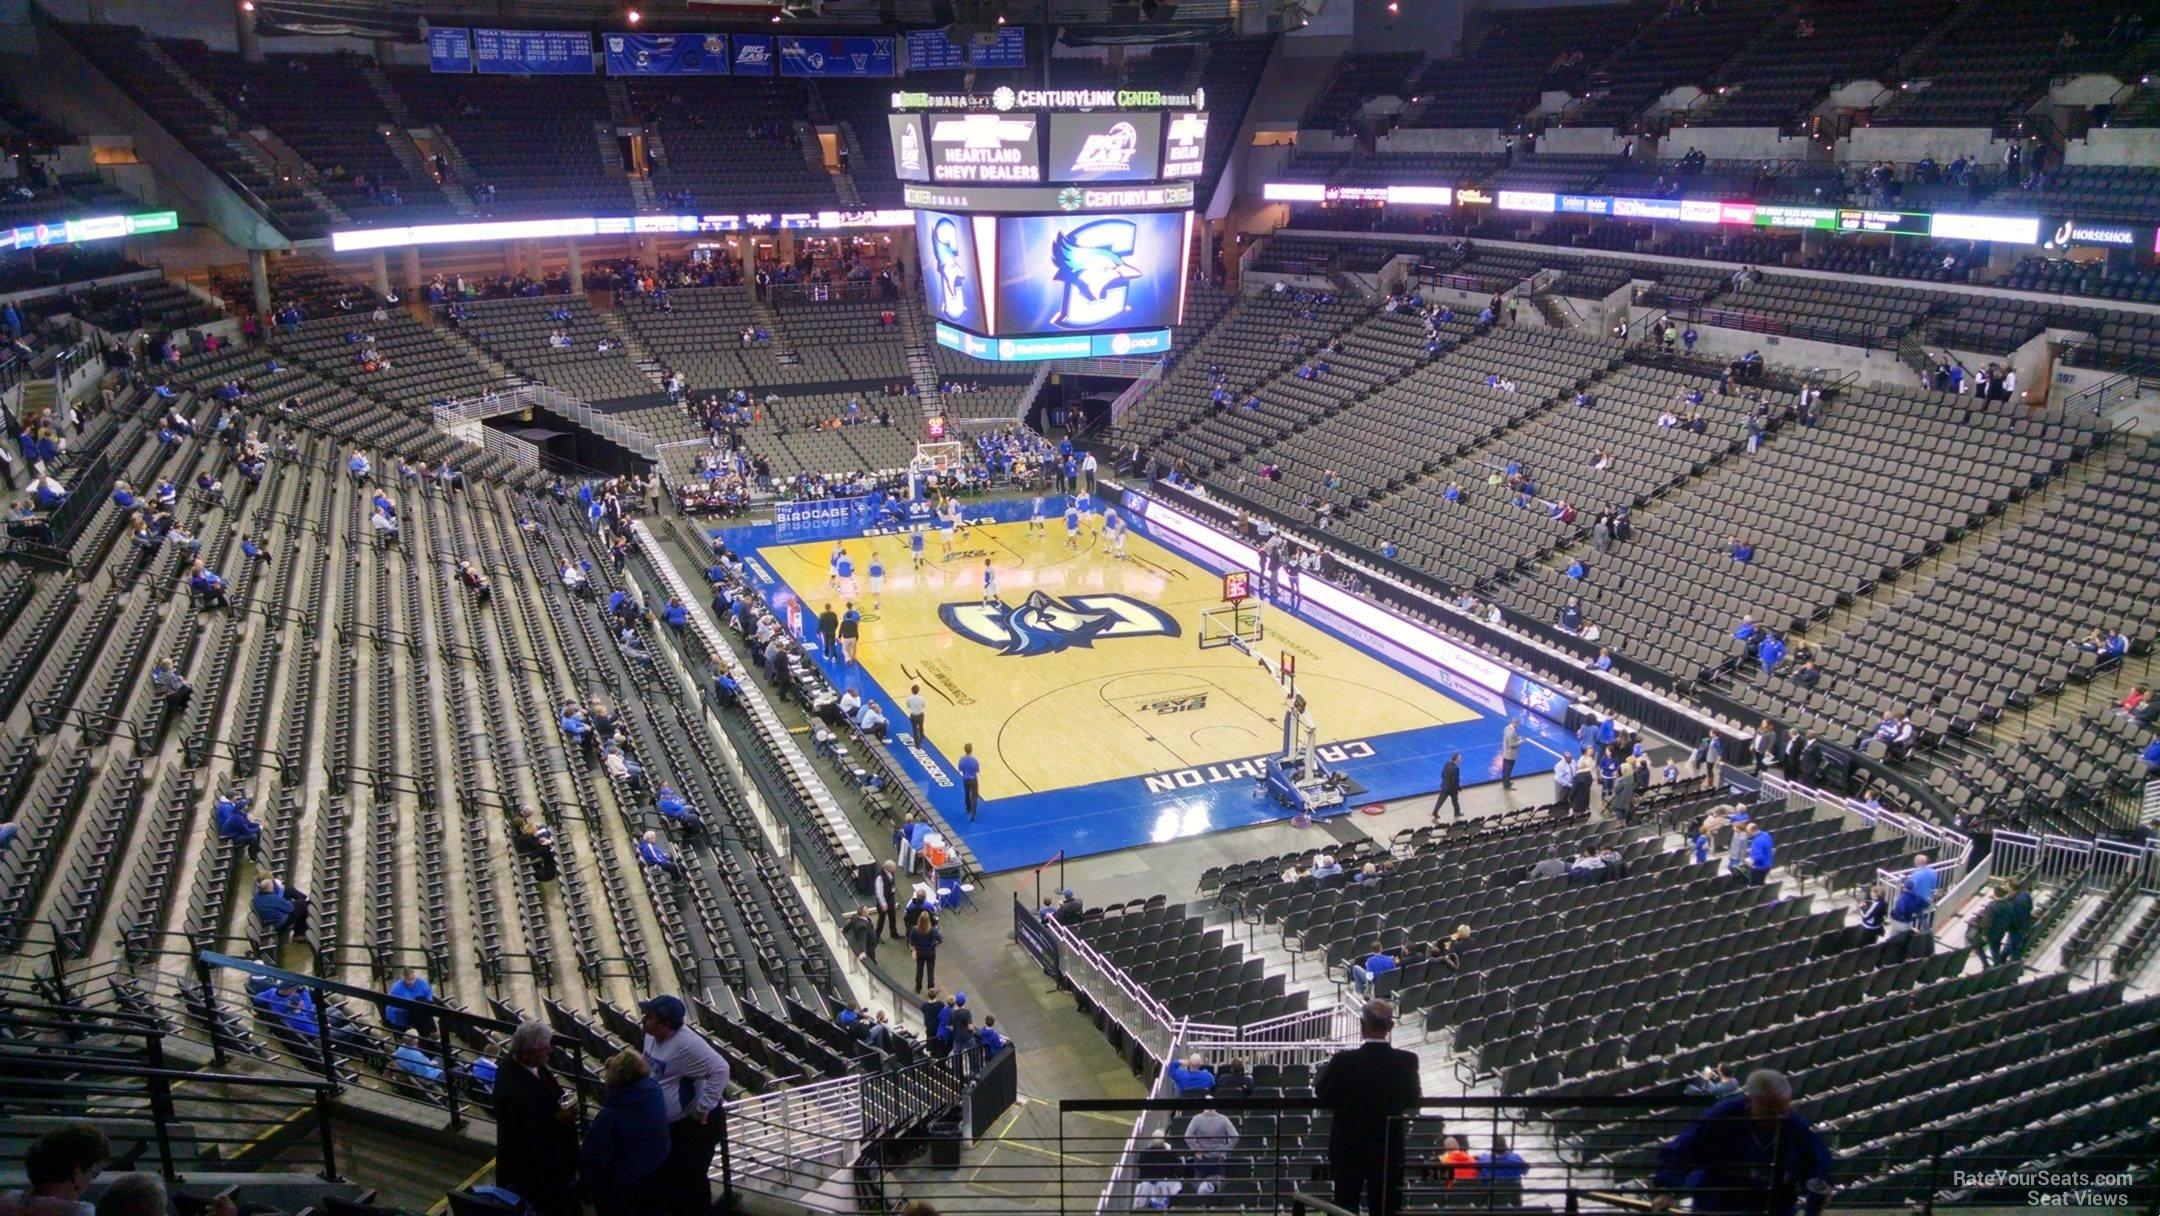 Centurylink Center Omaha >> Chi Health Center Omaha Section 215 Creighton Basketball